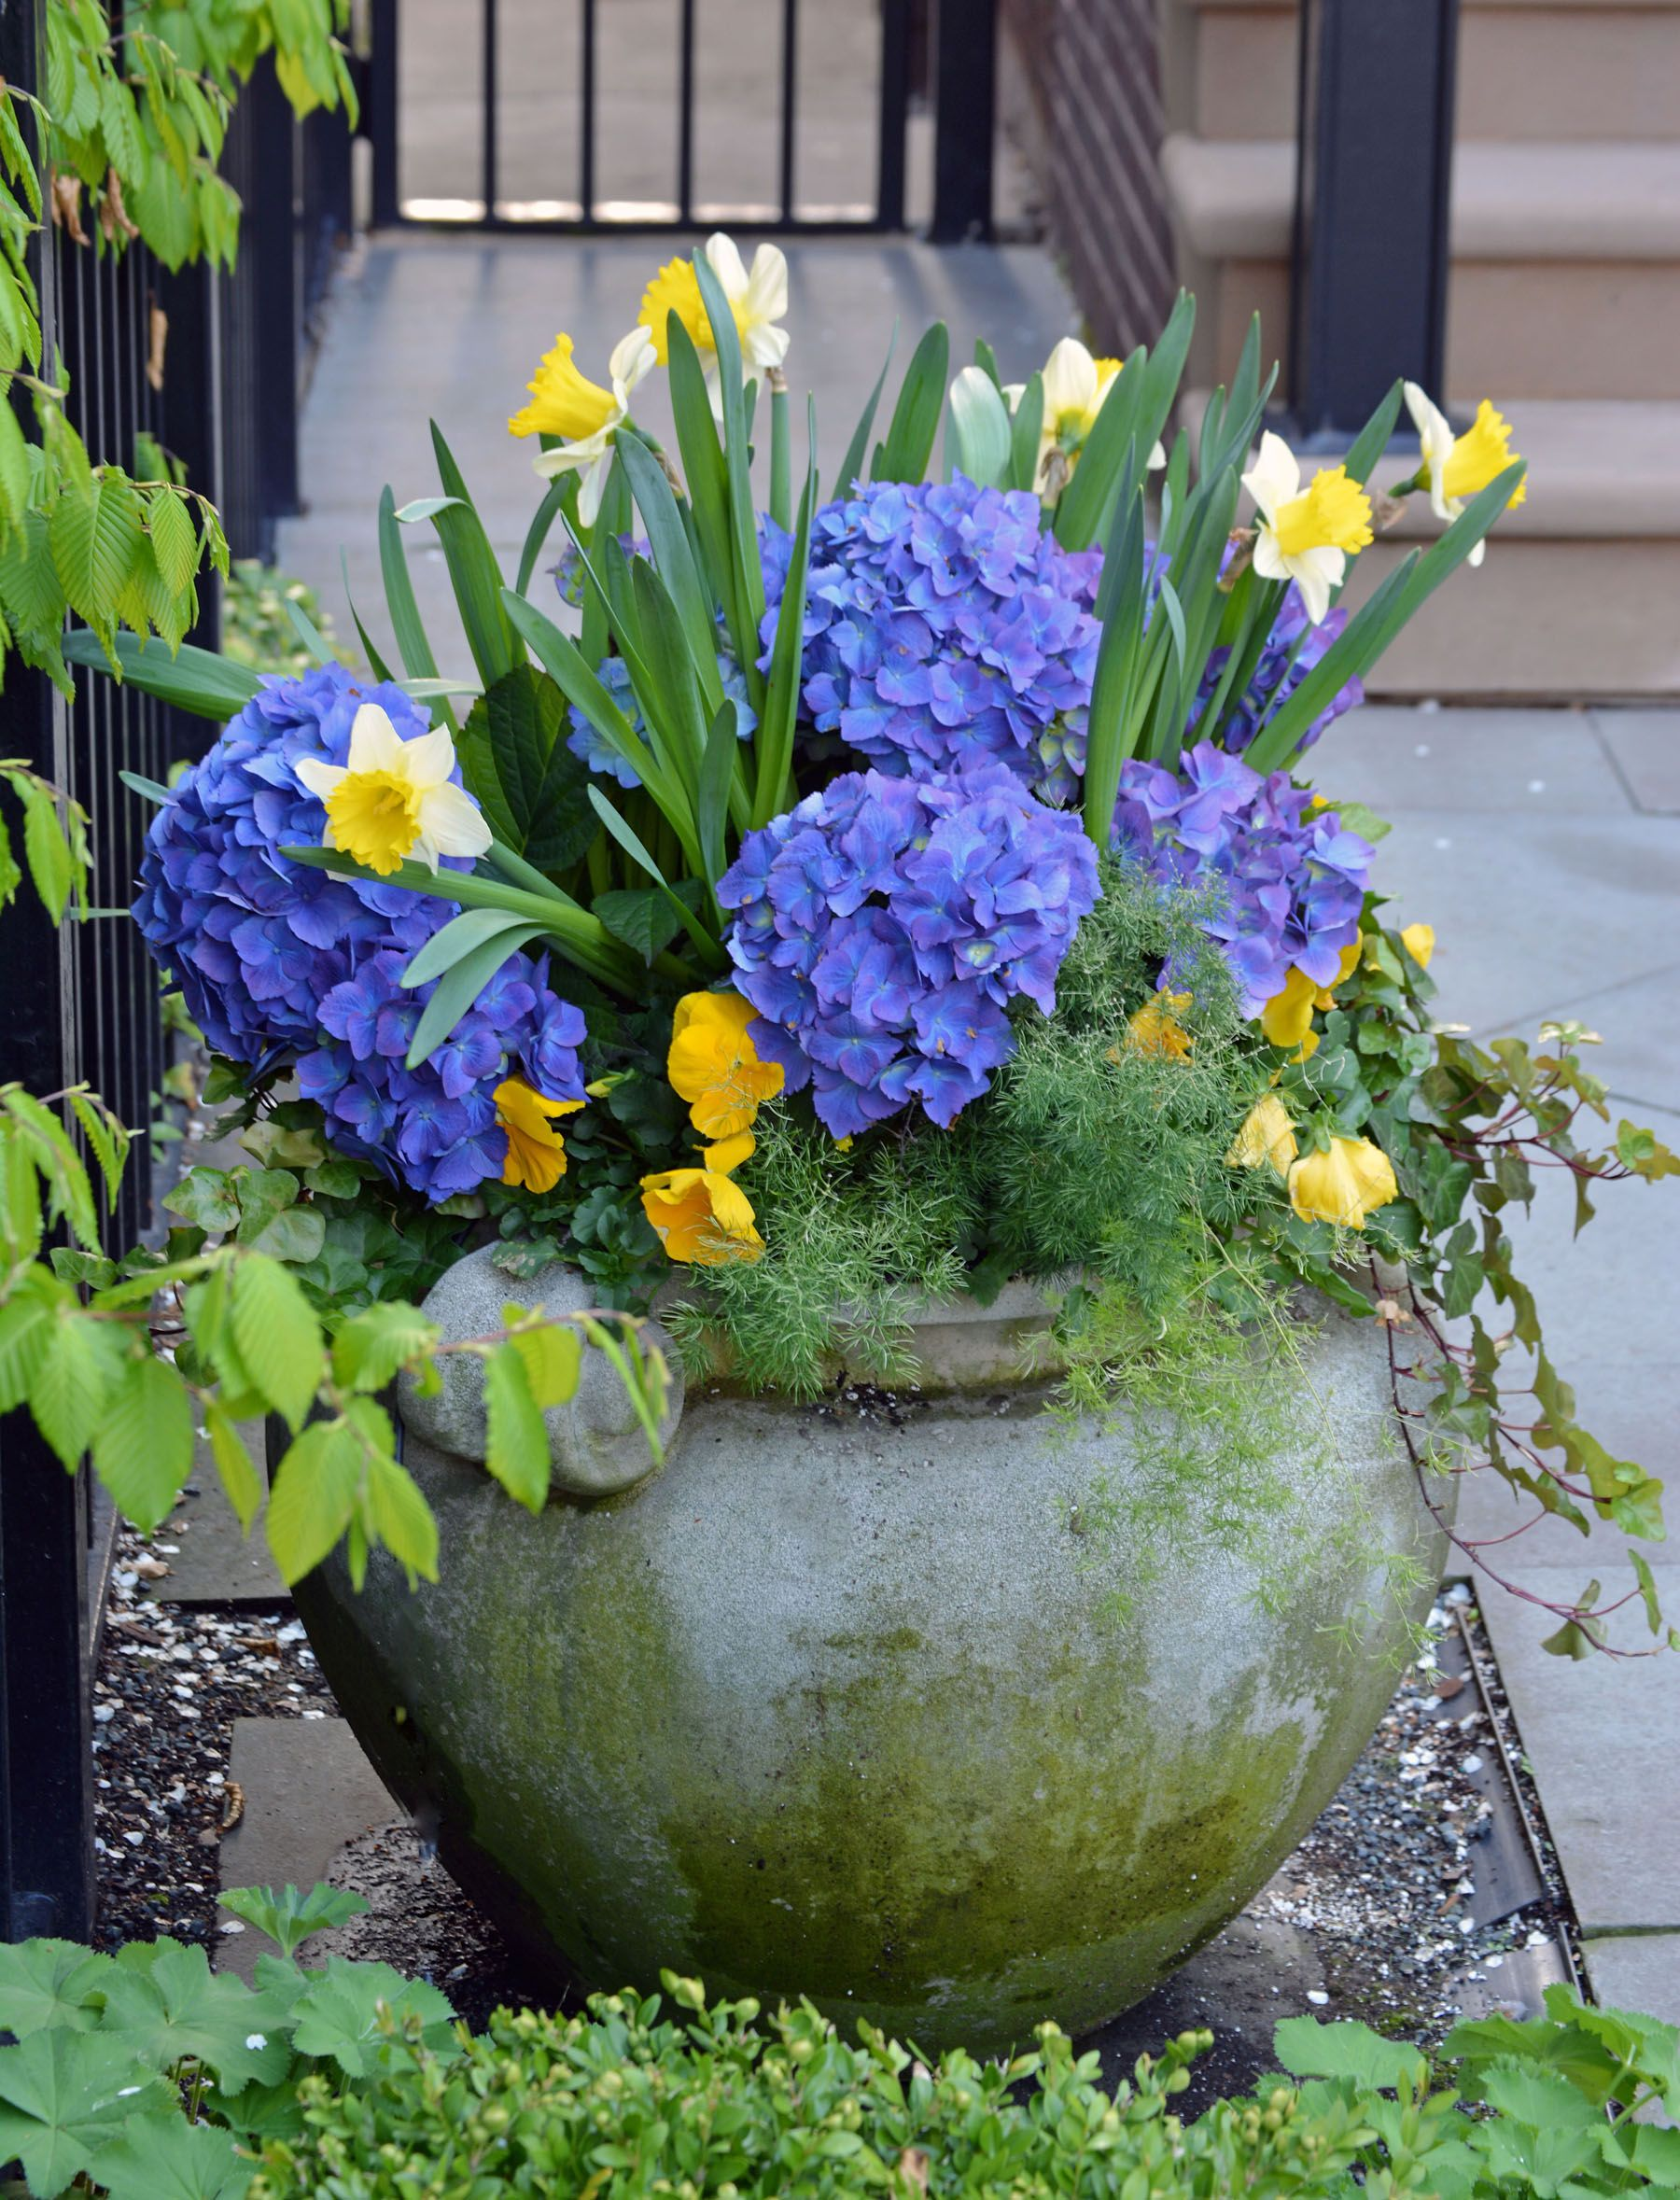 Urban gardening ideas containers - Spring Annuals Planter Container Urban Garden Landscape Design Ideas